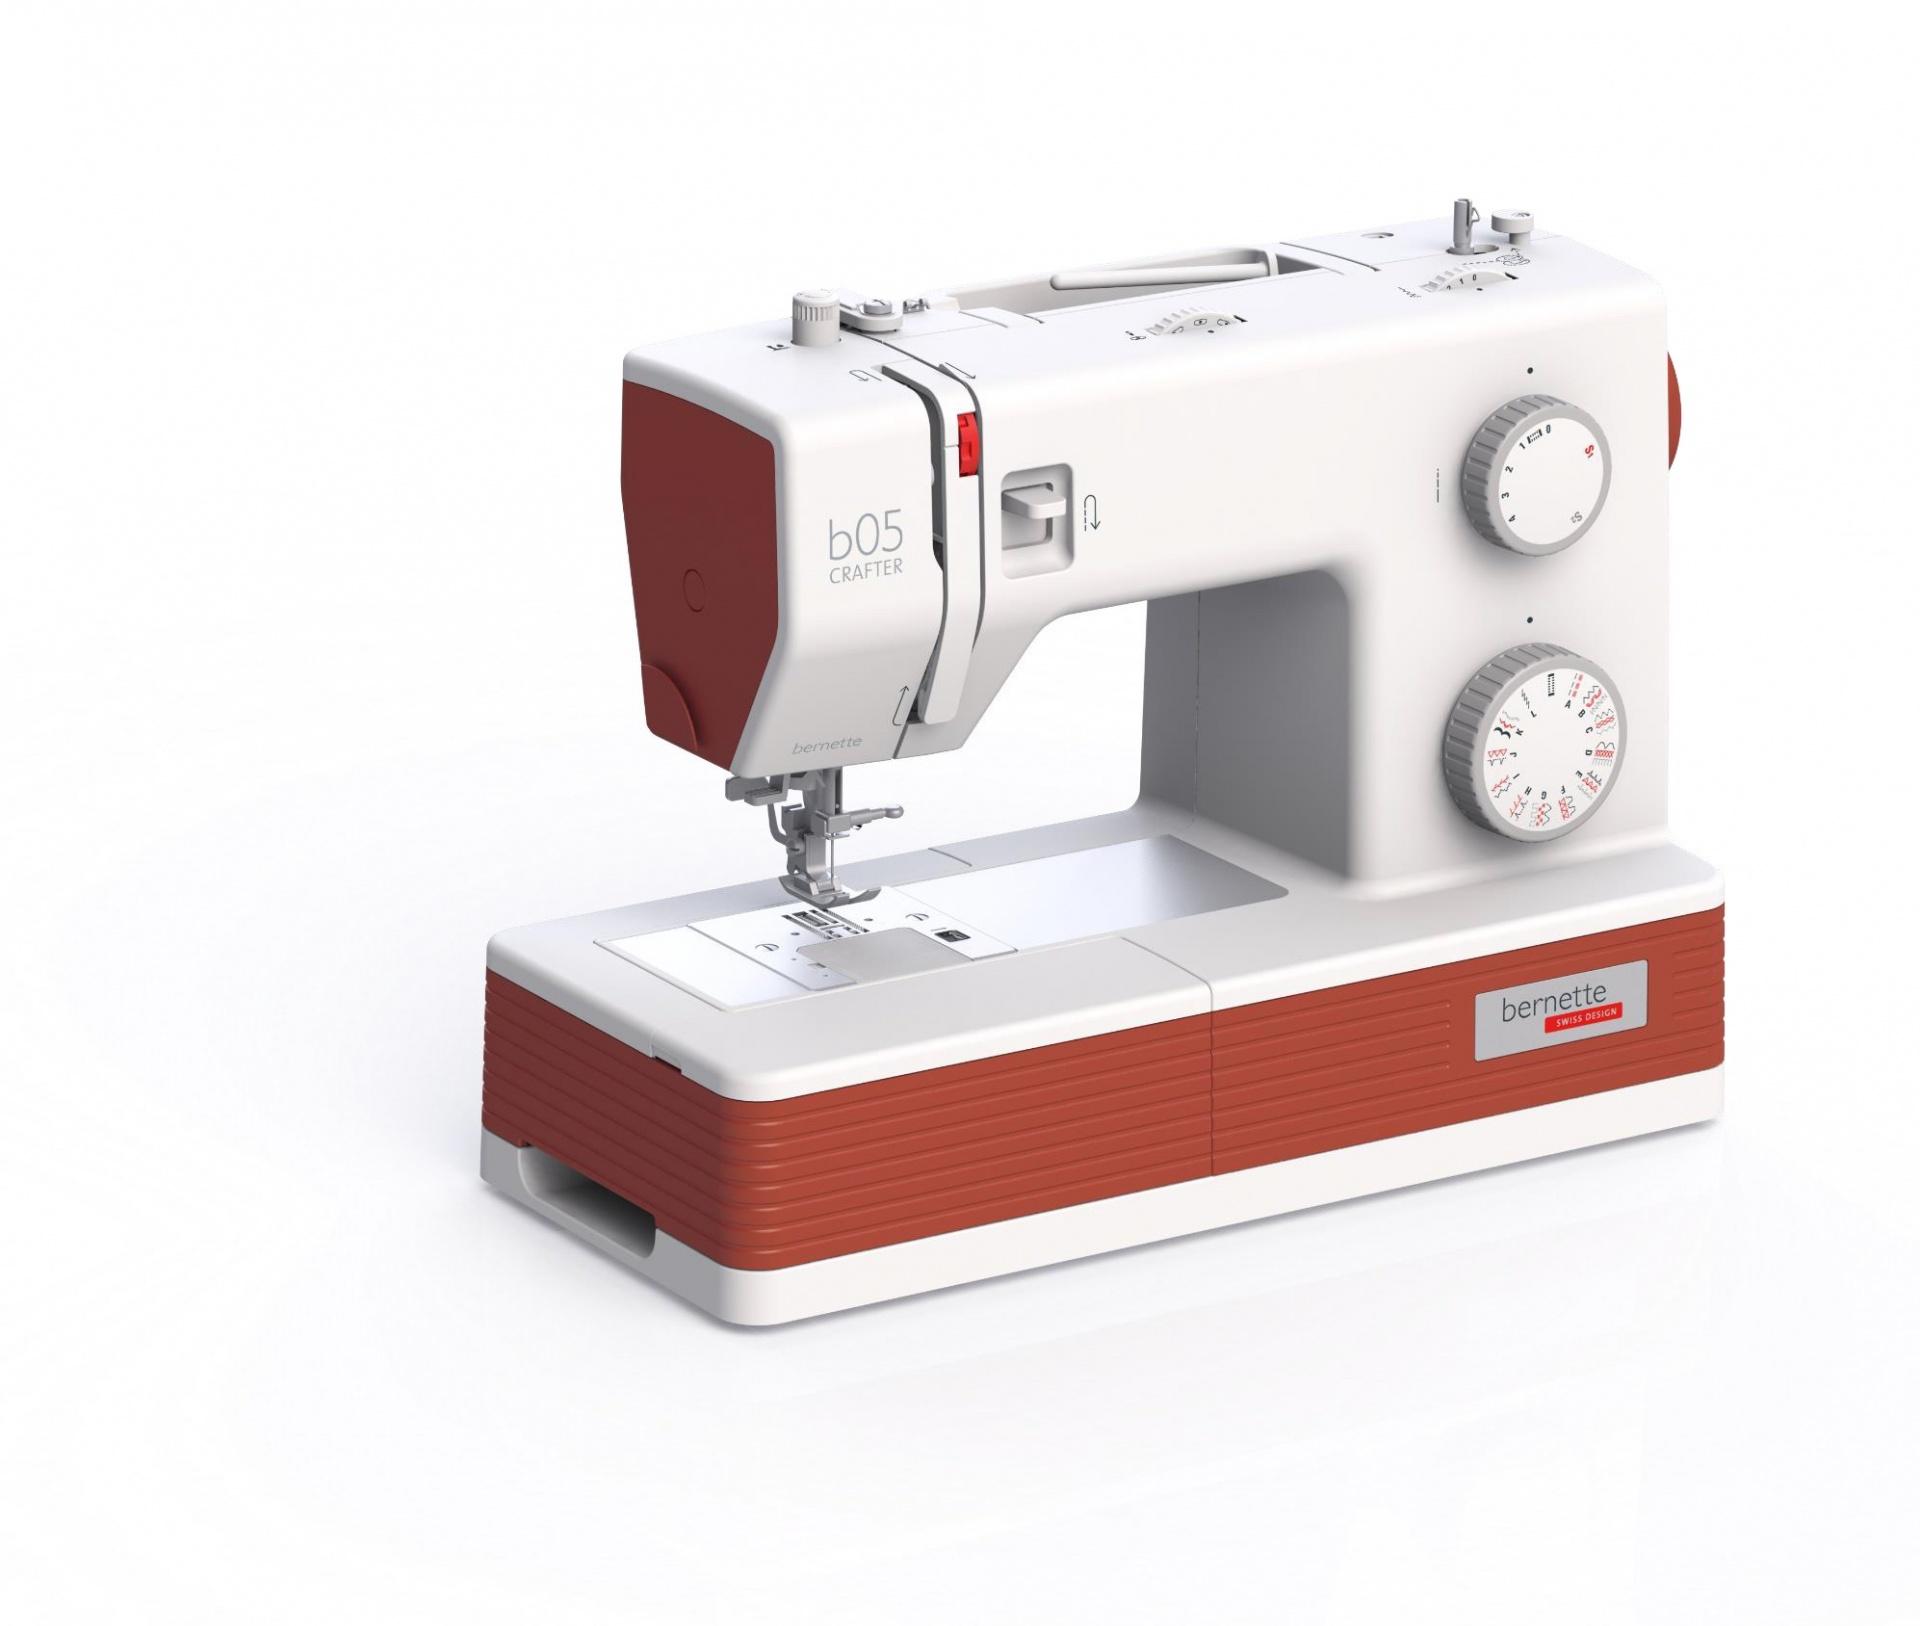 BERNETTE B05 Crafter